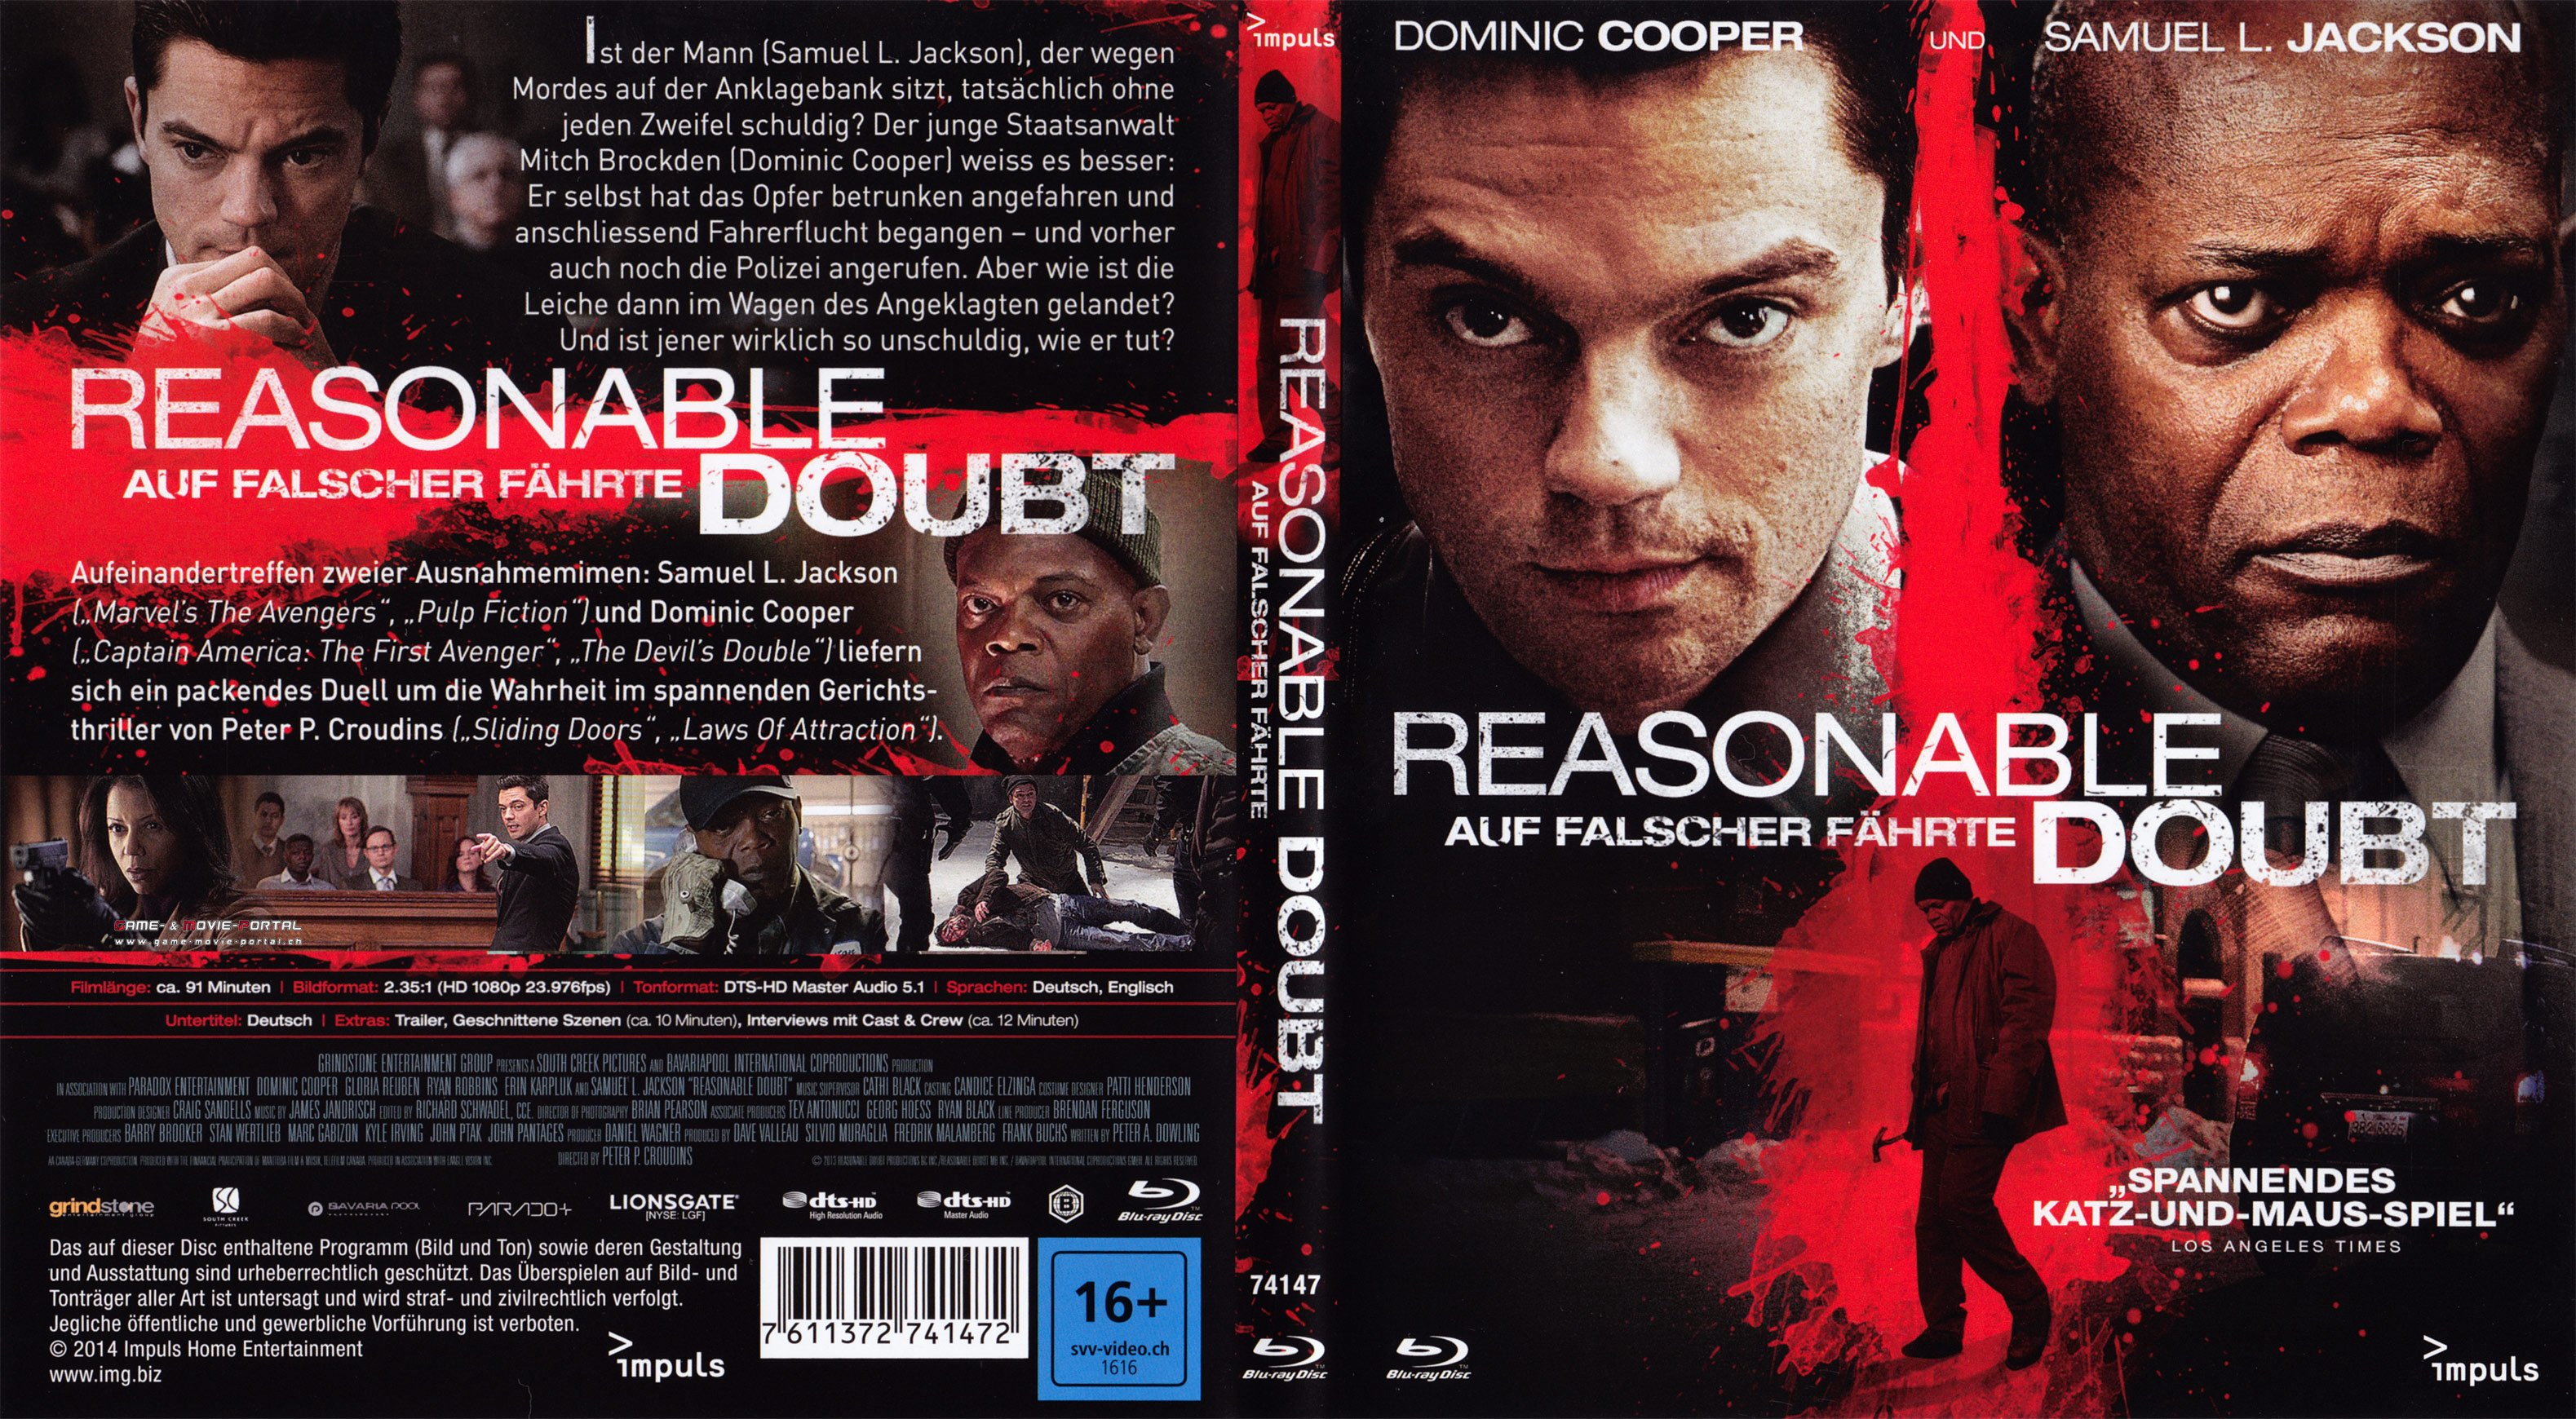 reasonable doubt auf falscher faehrte blu ray cover german german dvd covers. Black Bedroom Furniture Sets. Home Design Ideas